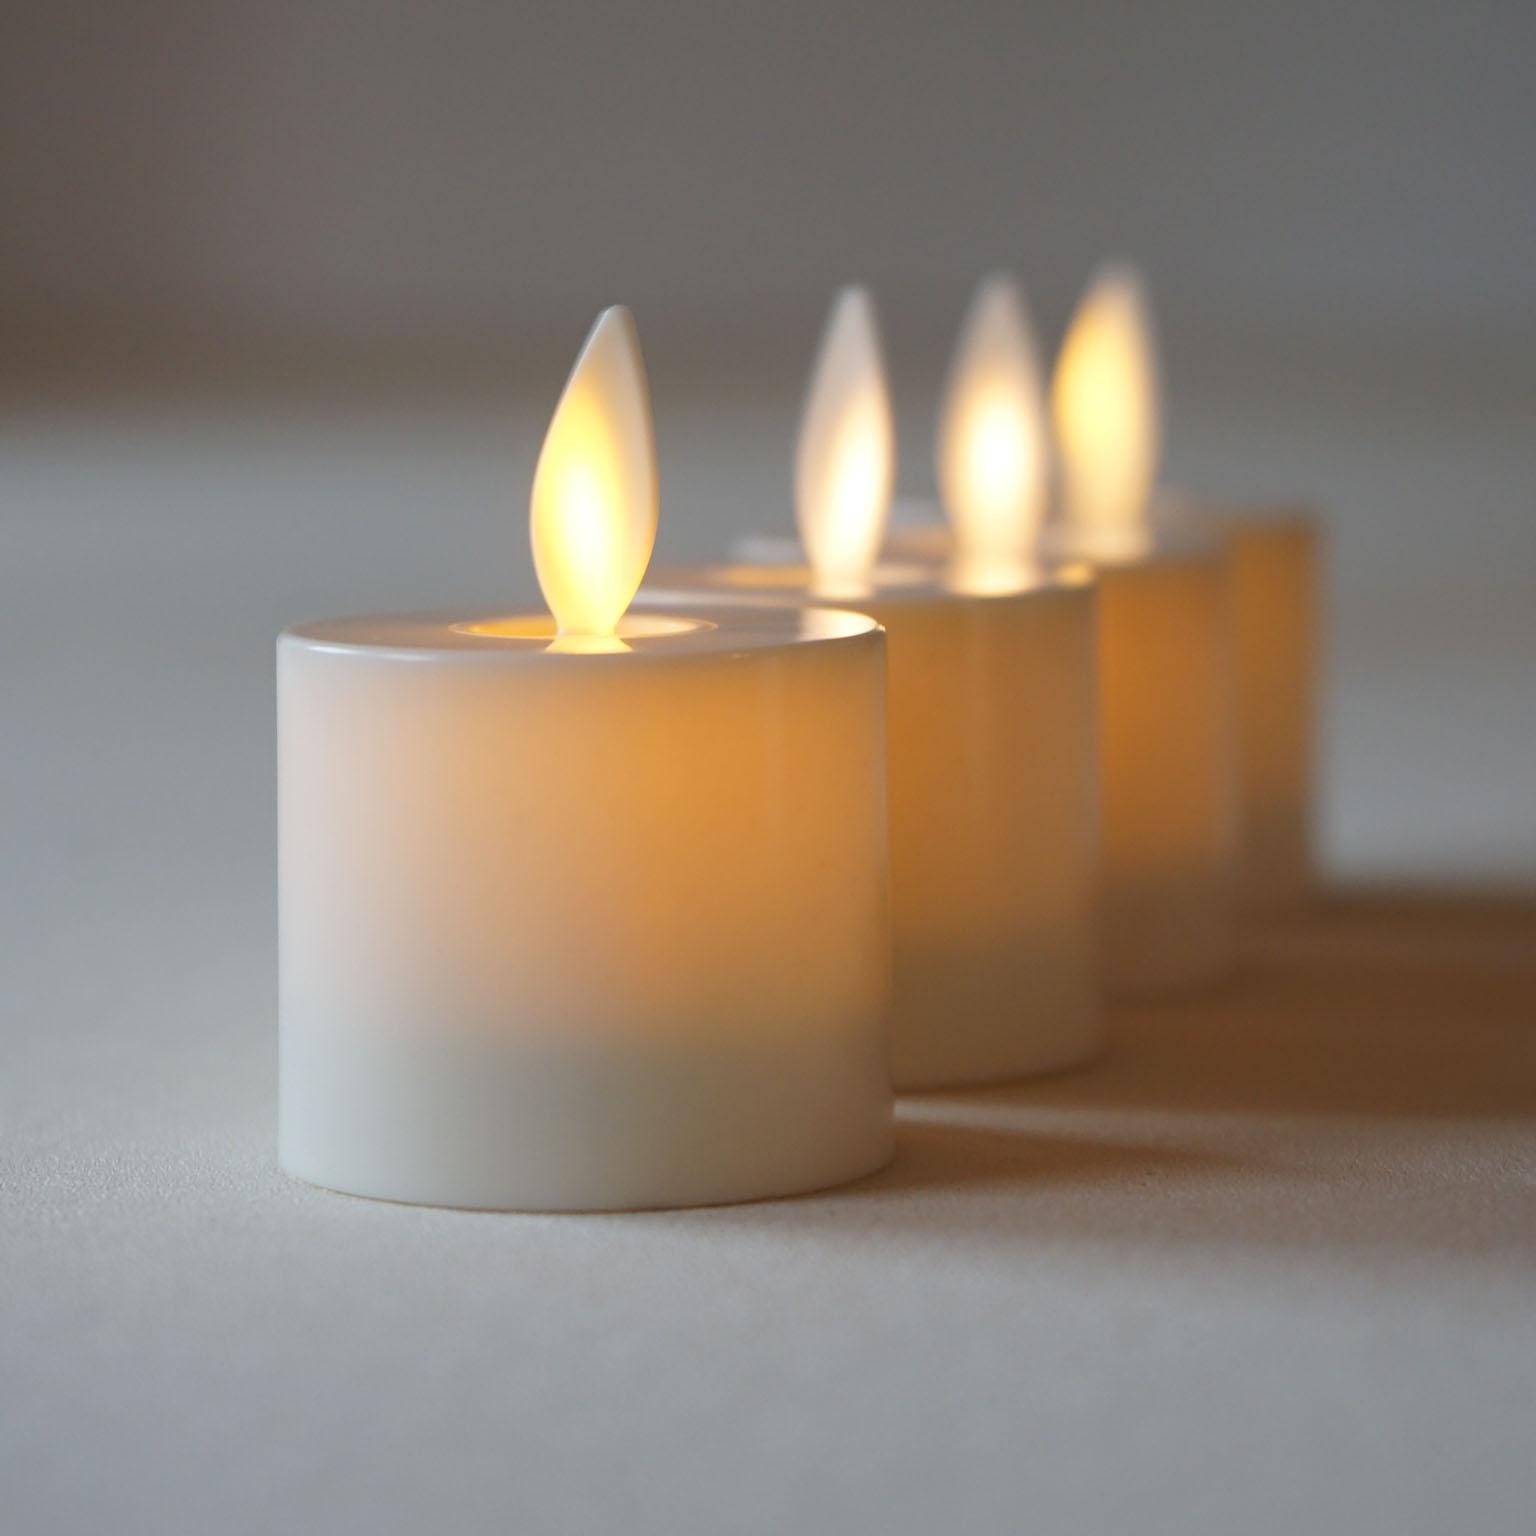 Luminara Flameless LED TeaLight Candles Ivory Real Flame ...